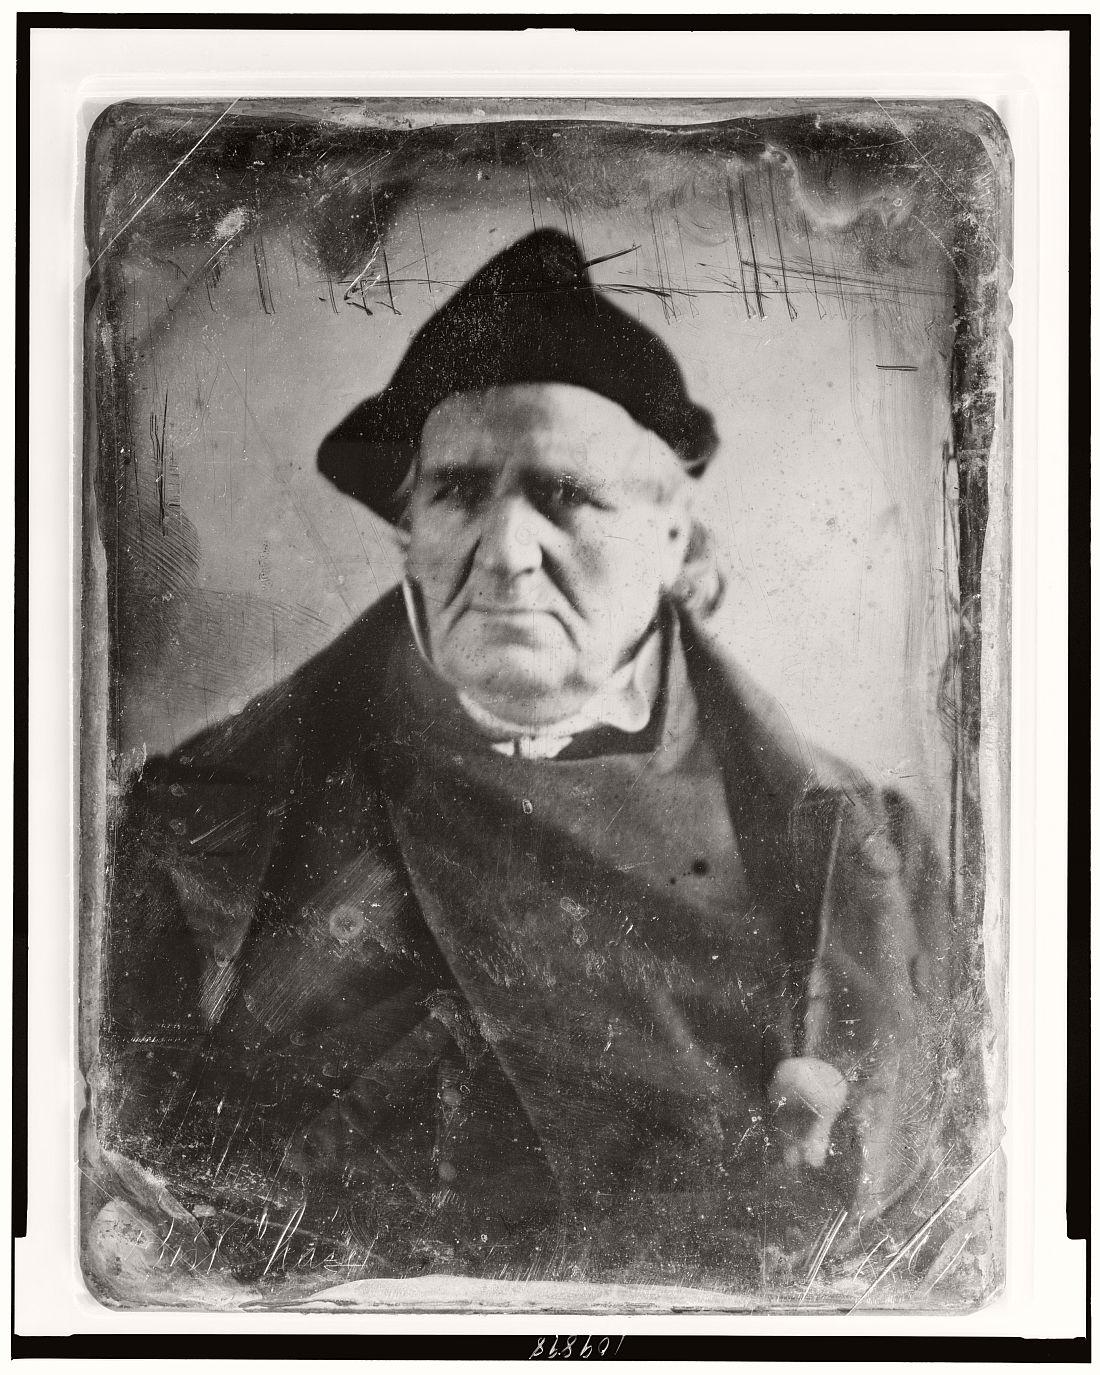 vintage-daguerreotype-portraits-from-xix-century-1844-1860-16